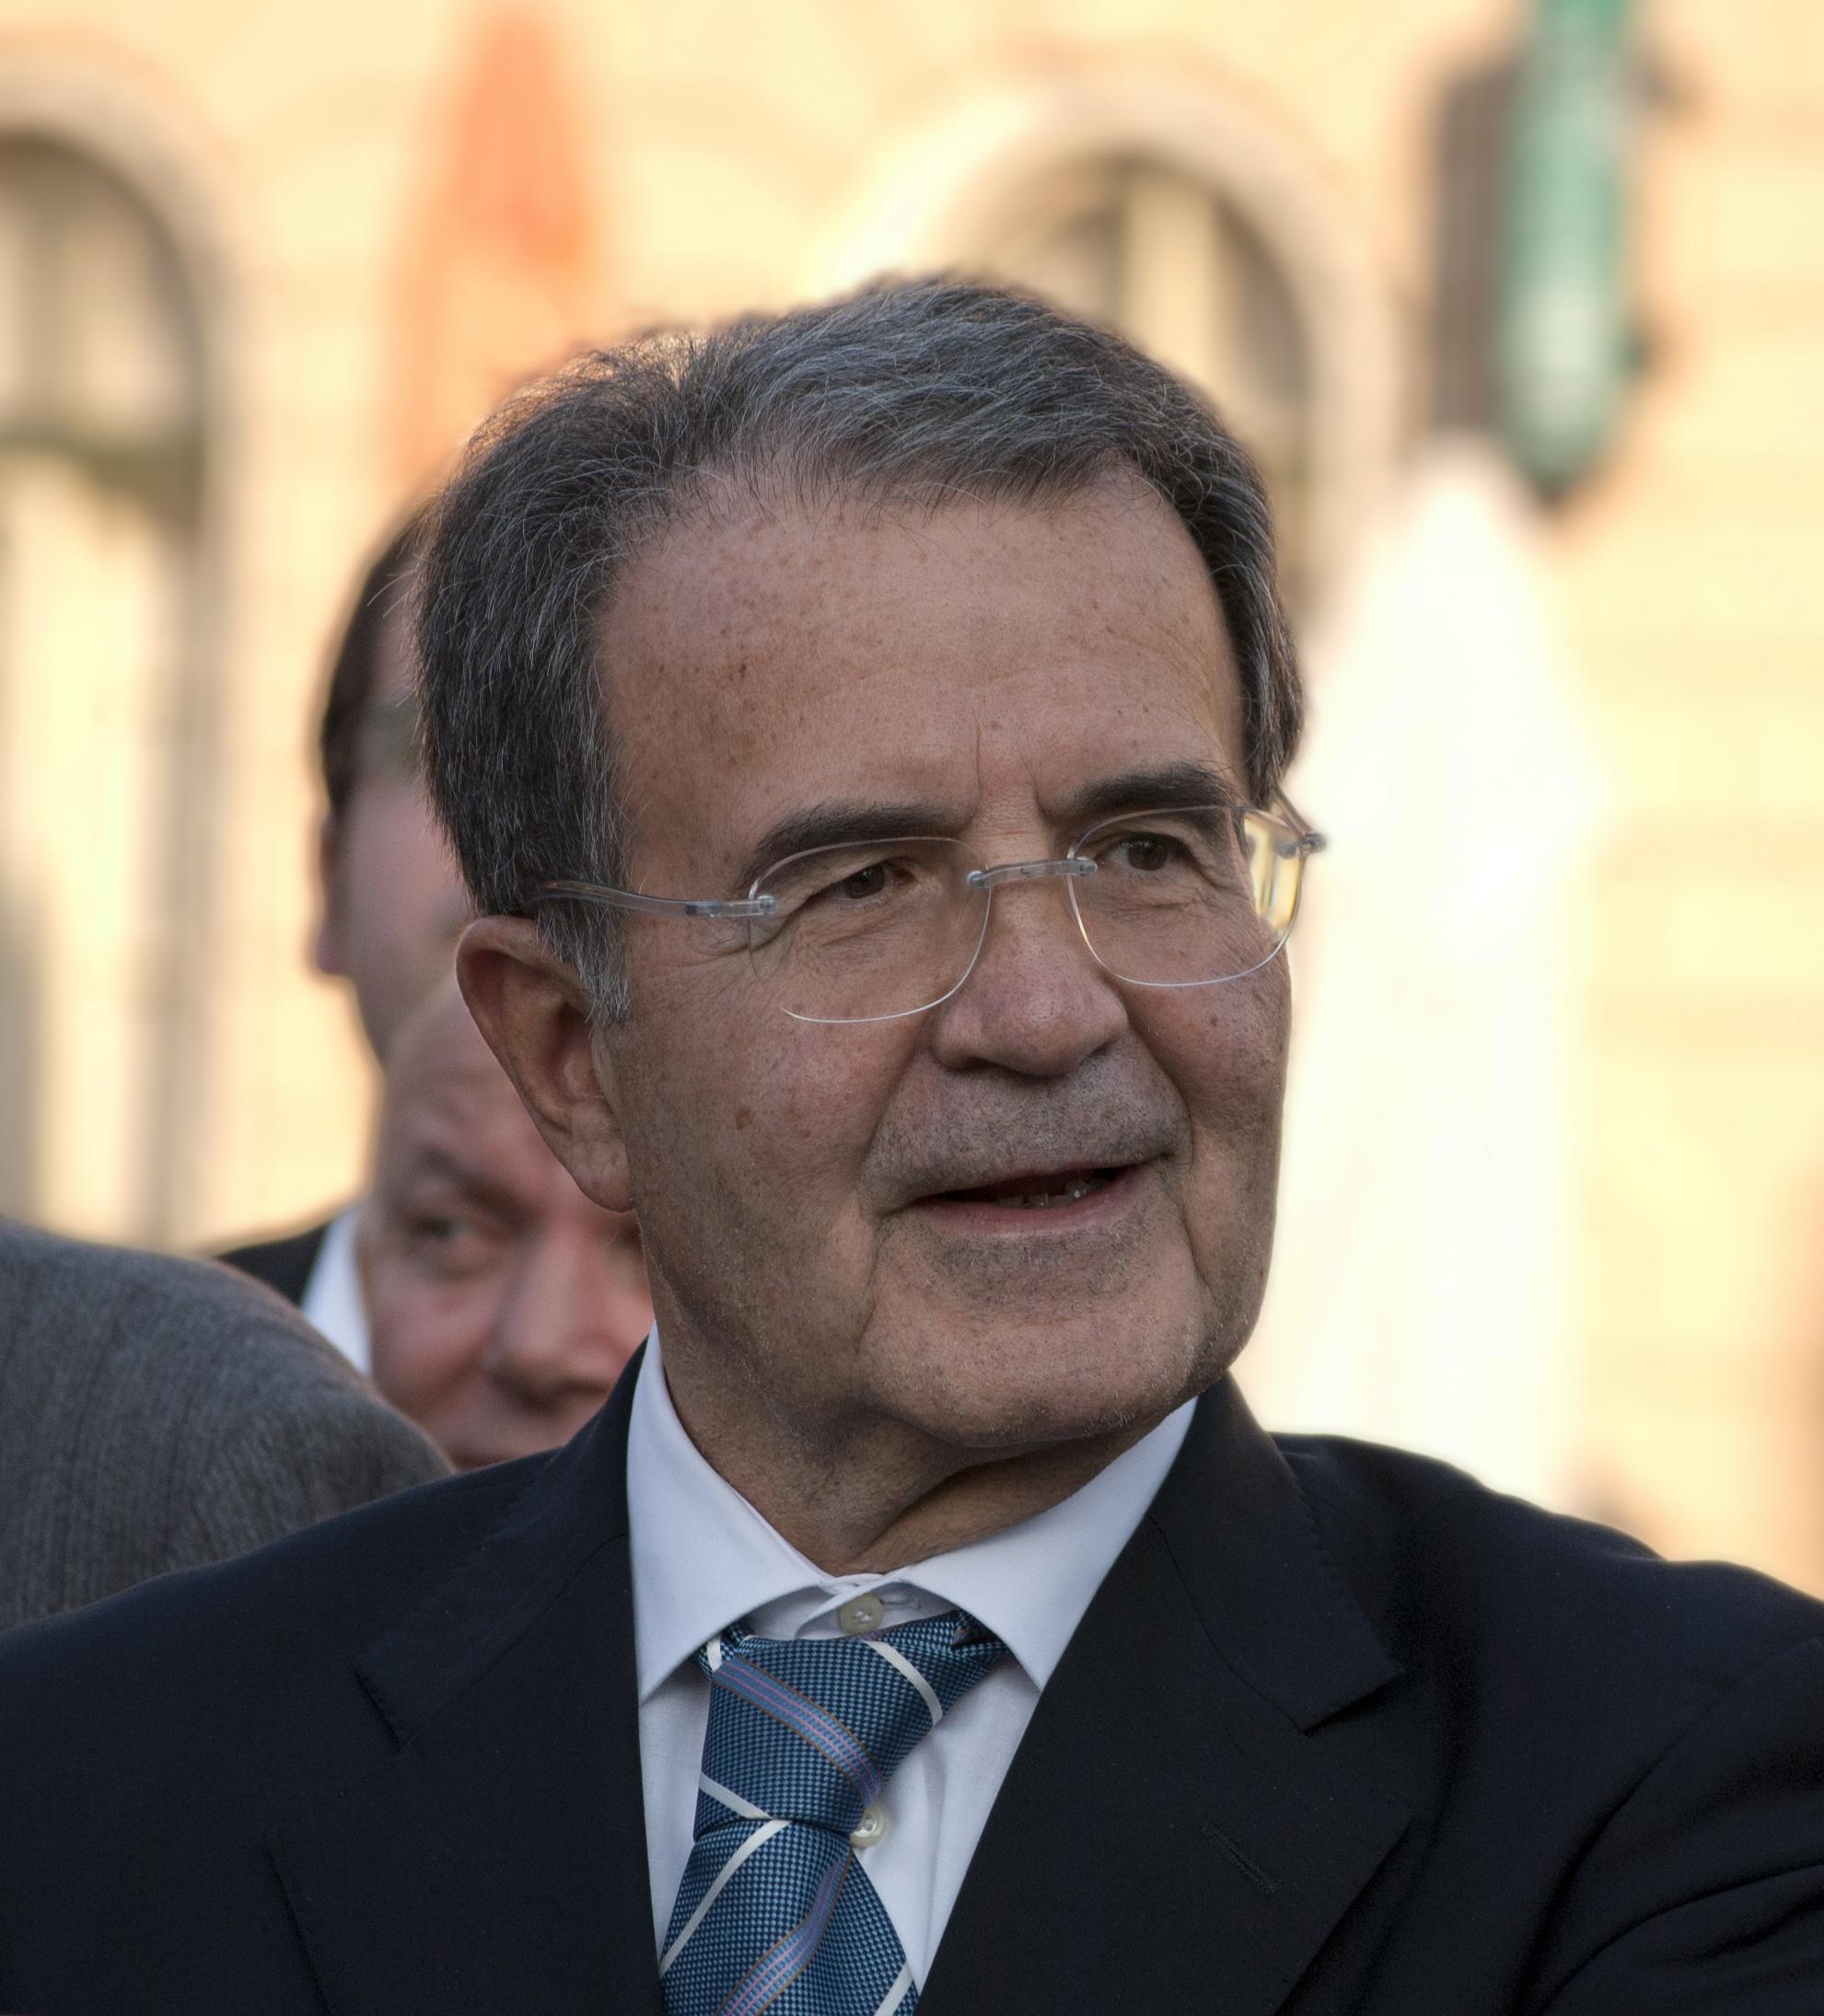 Romano Prodi Net Worth